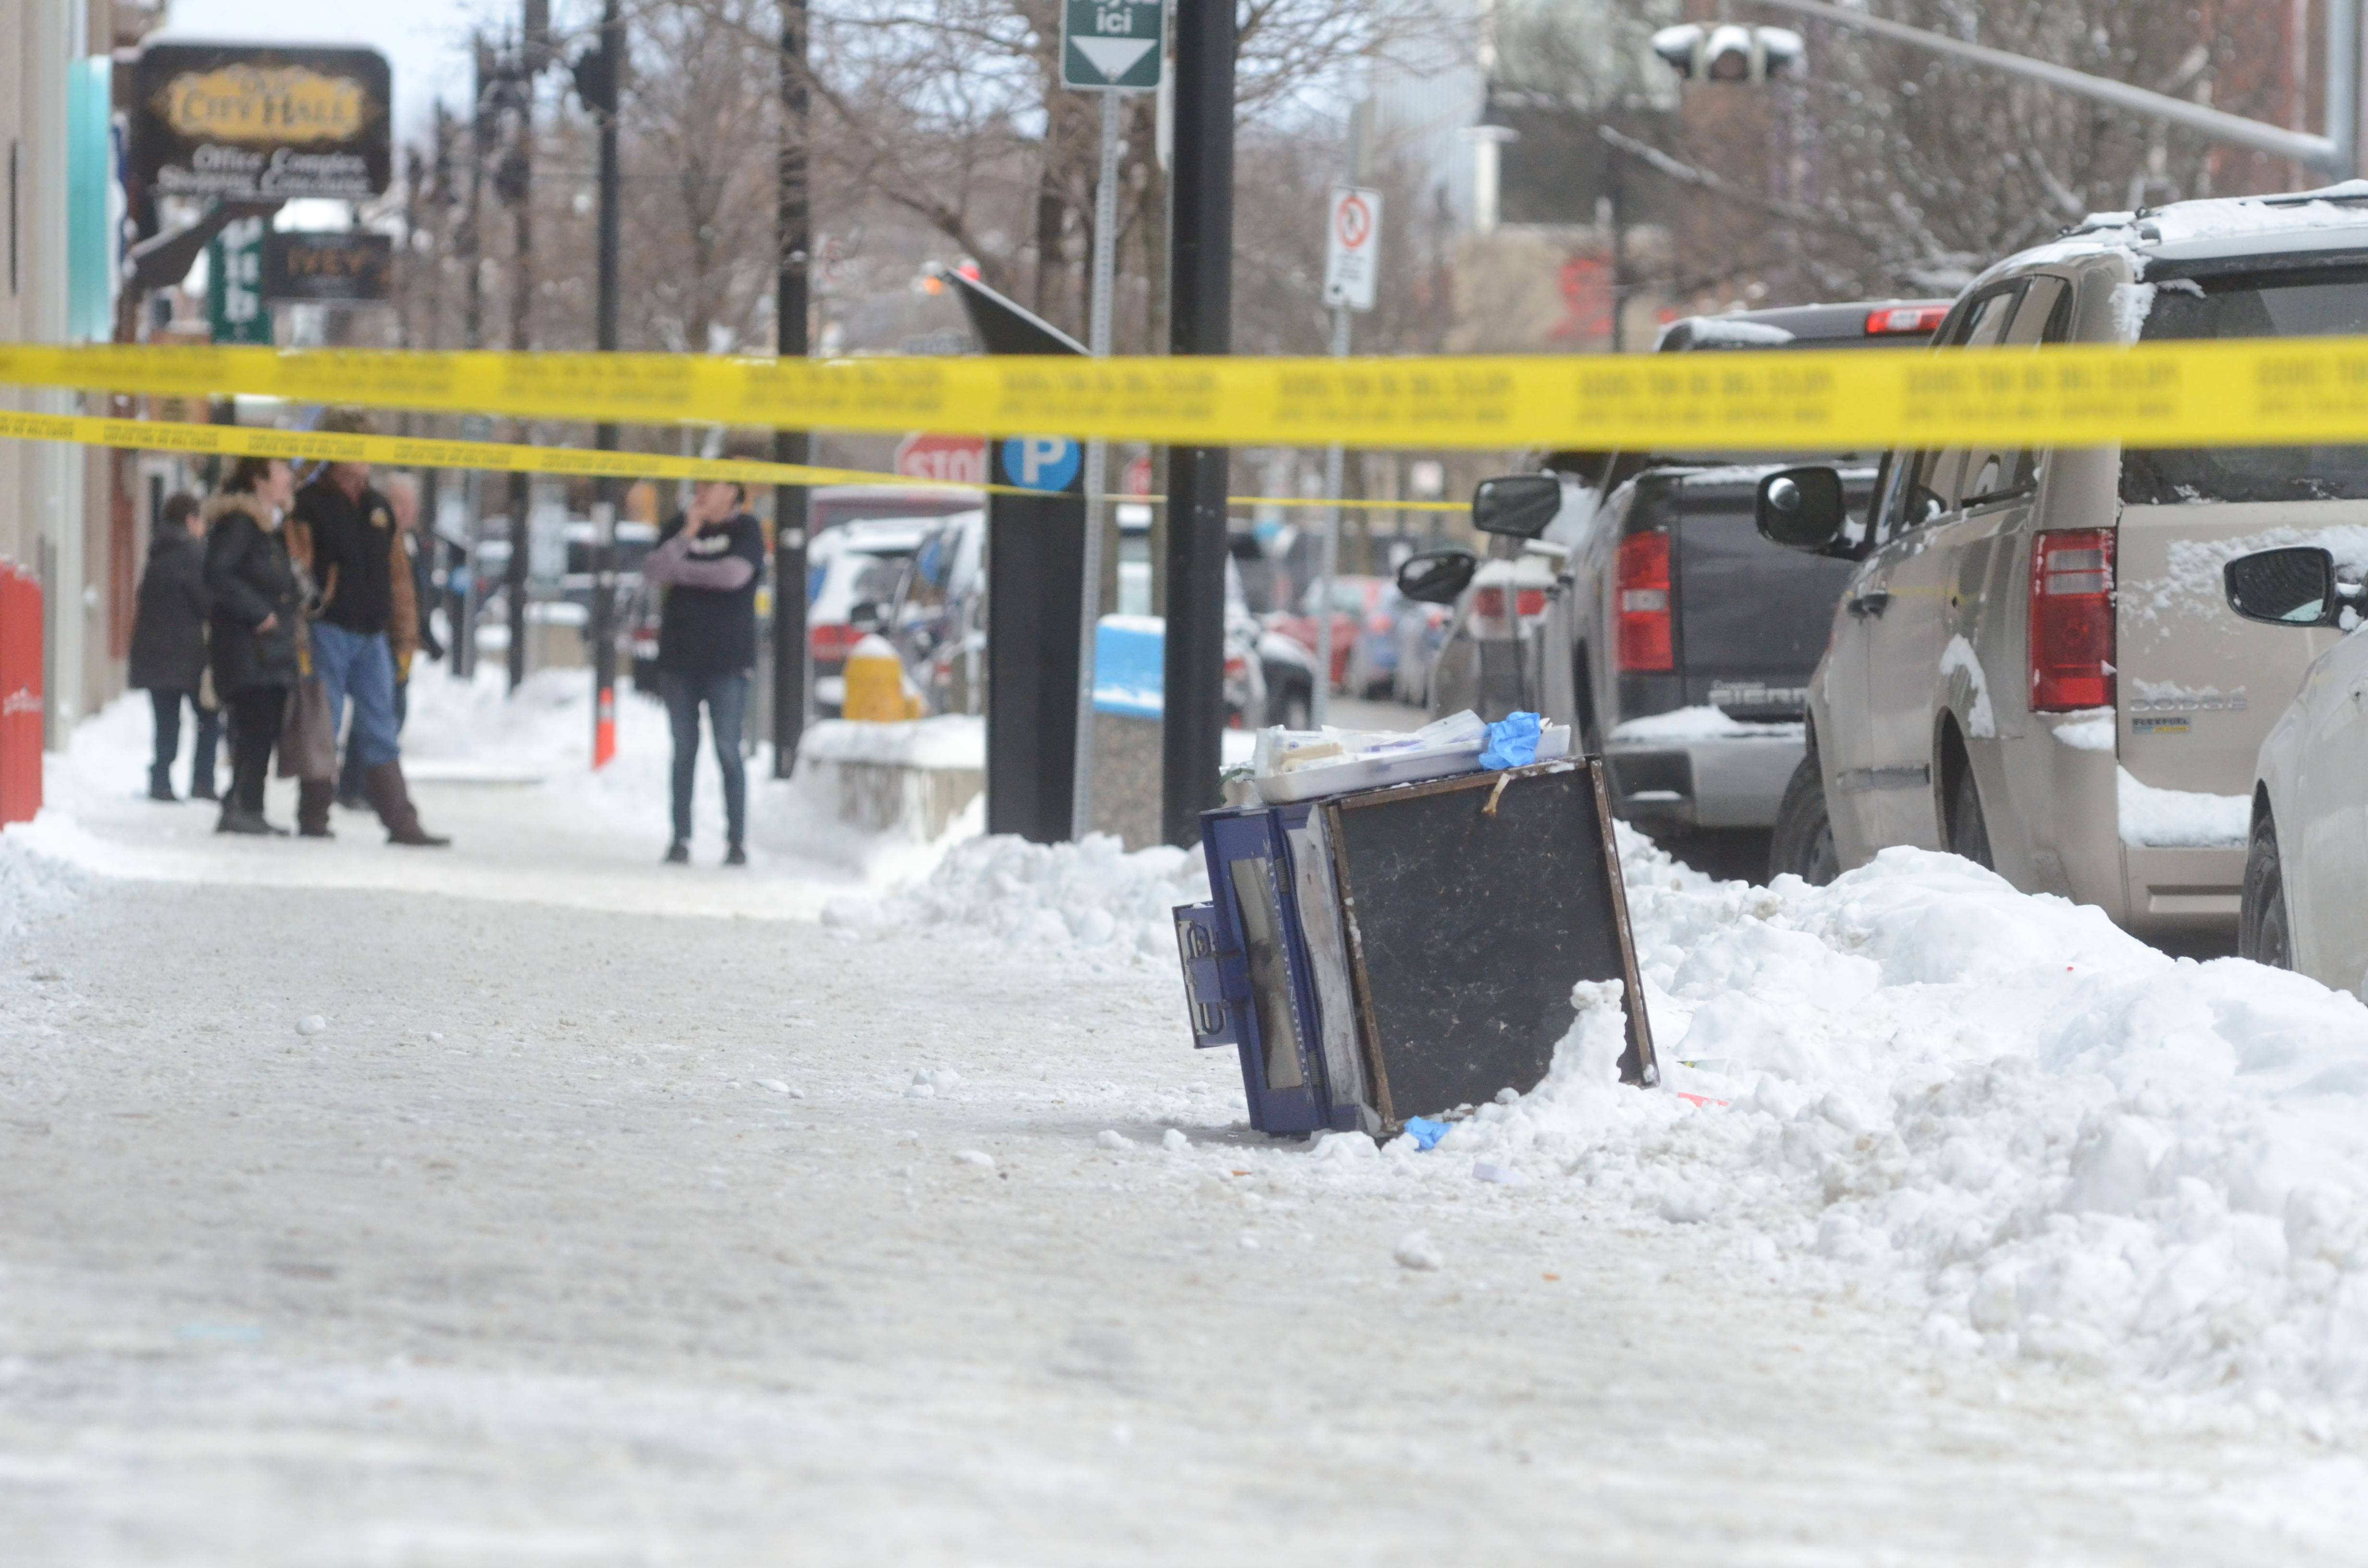 Update: Police make arrest after 17-year-old stabbing victim dies in downtown homicide